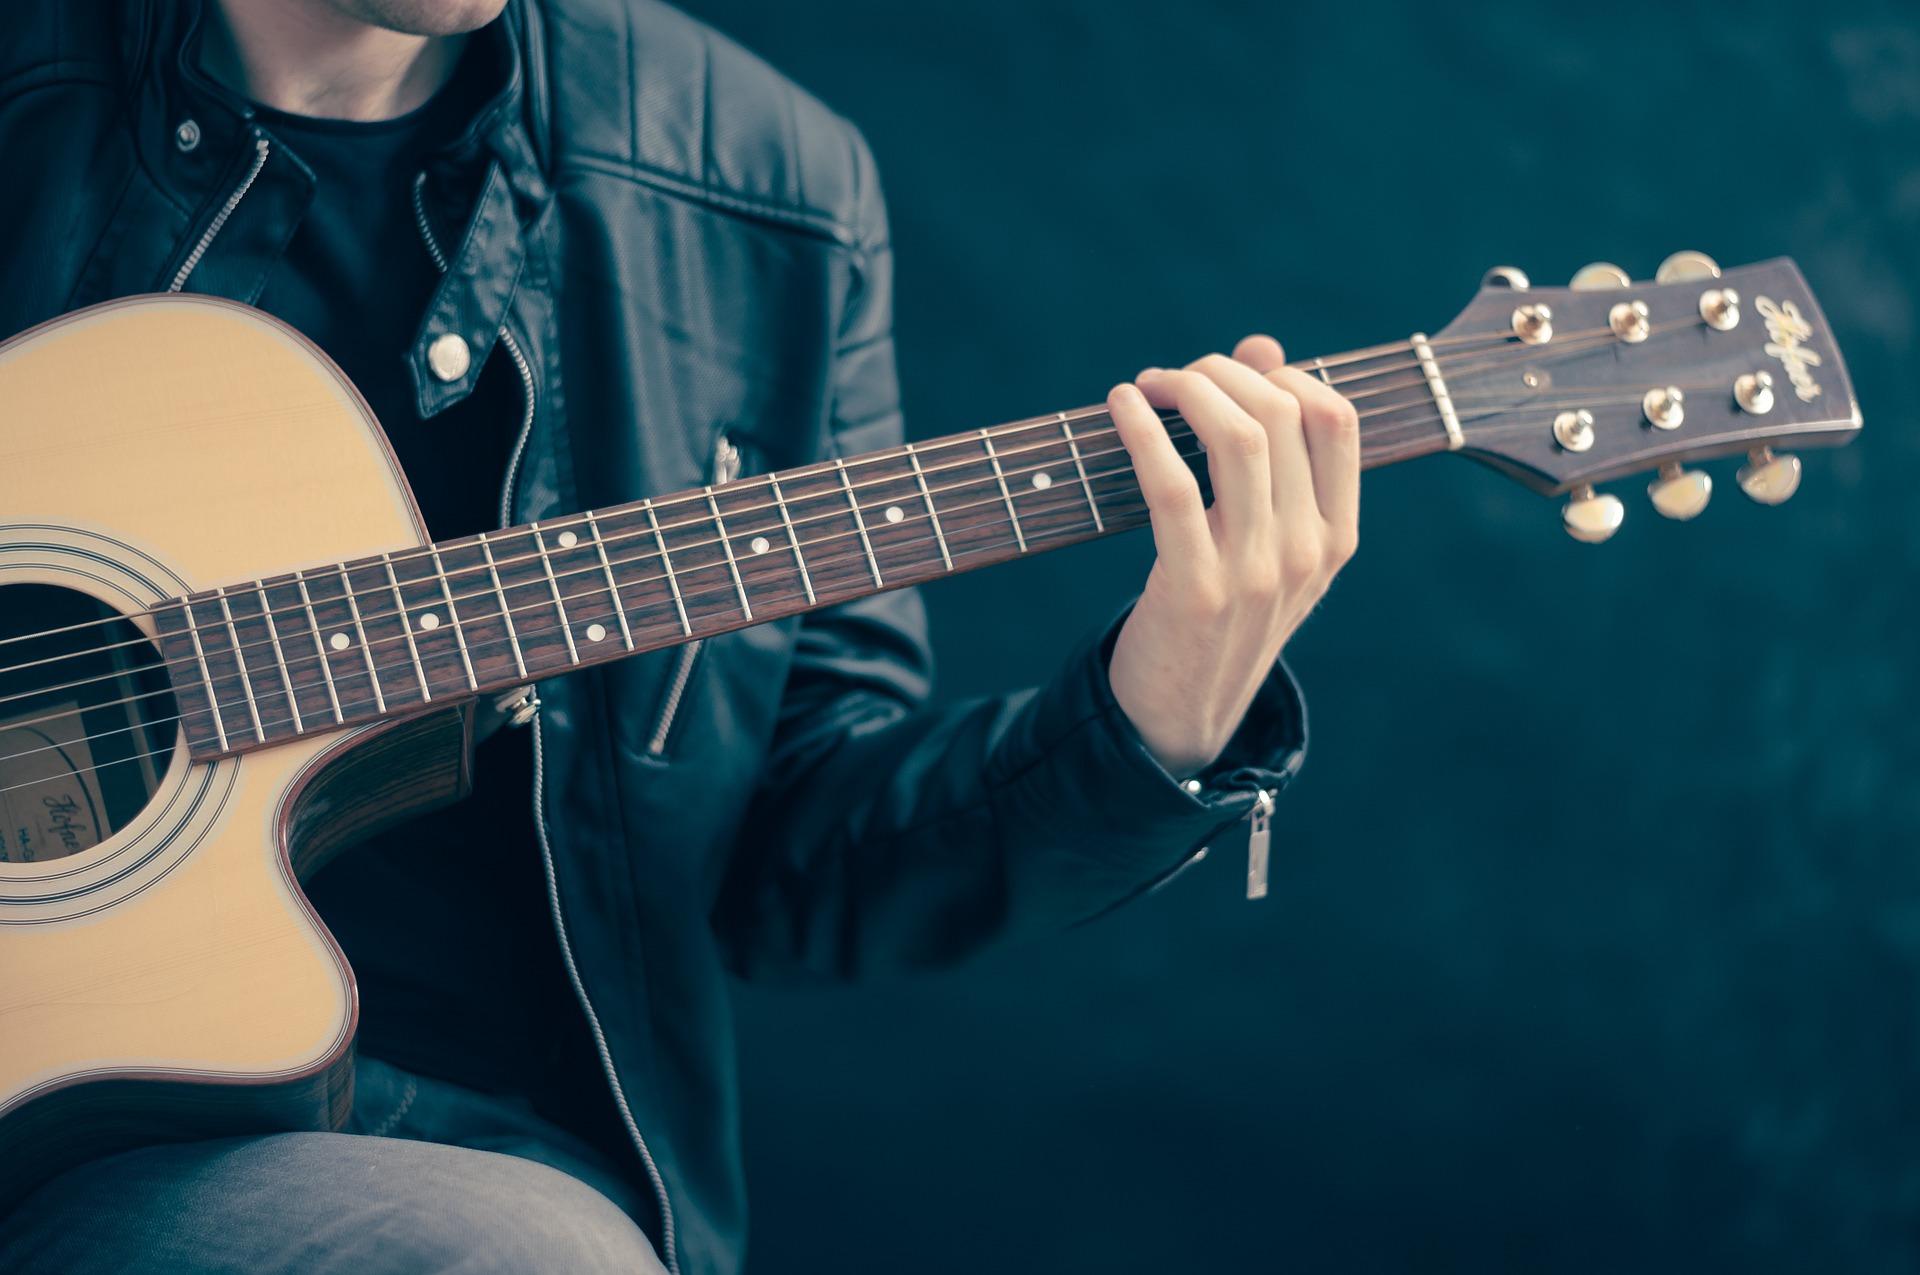 culture musique guitare Photo Pixabay via INFOSuroit